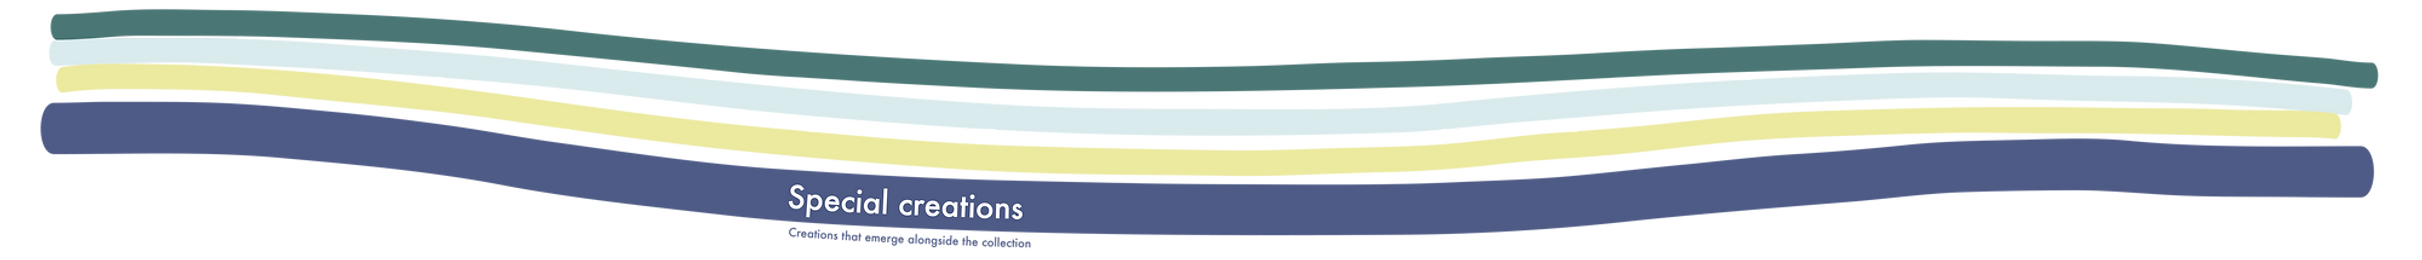 Graphisme lignes-Special creations 01-01